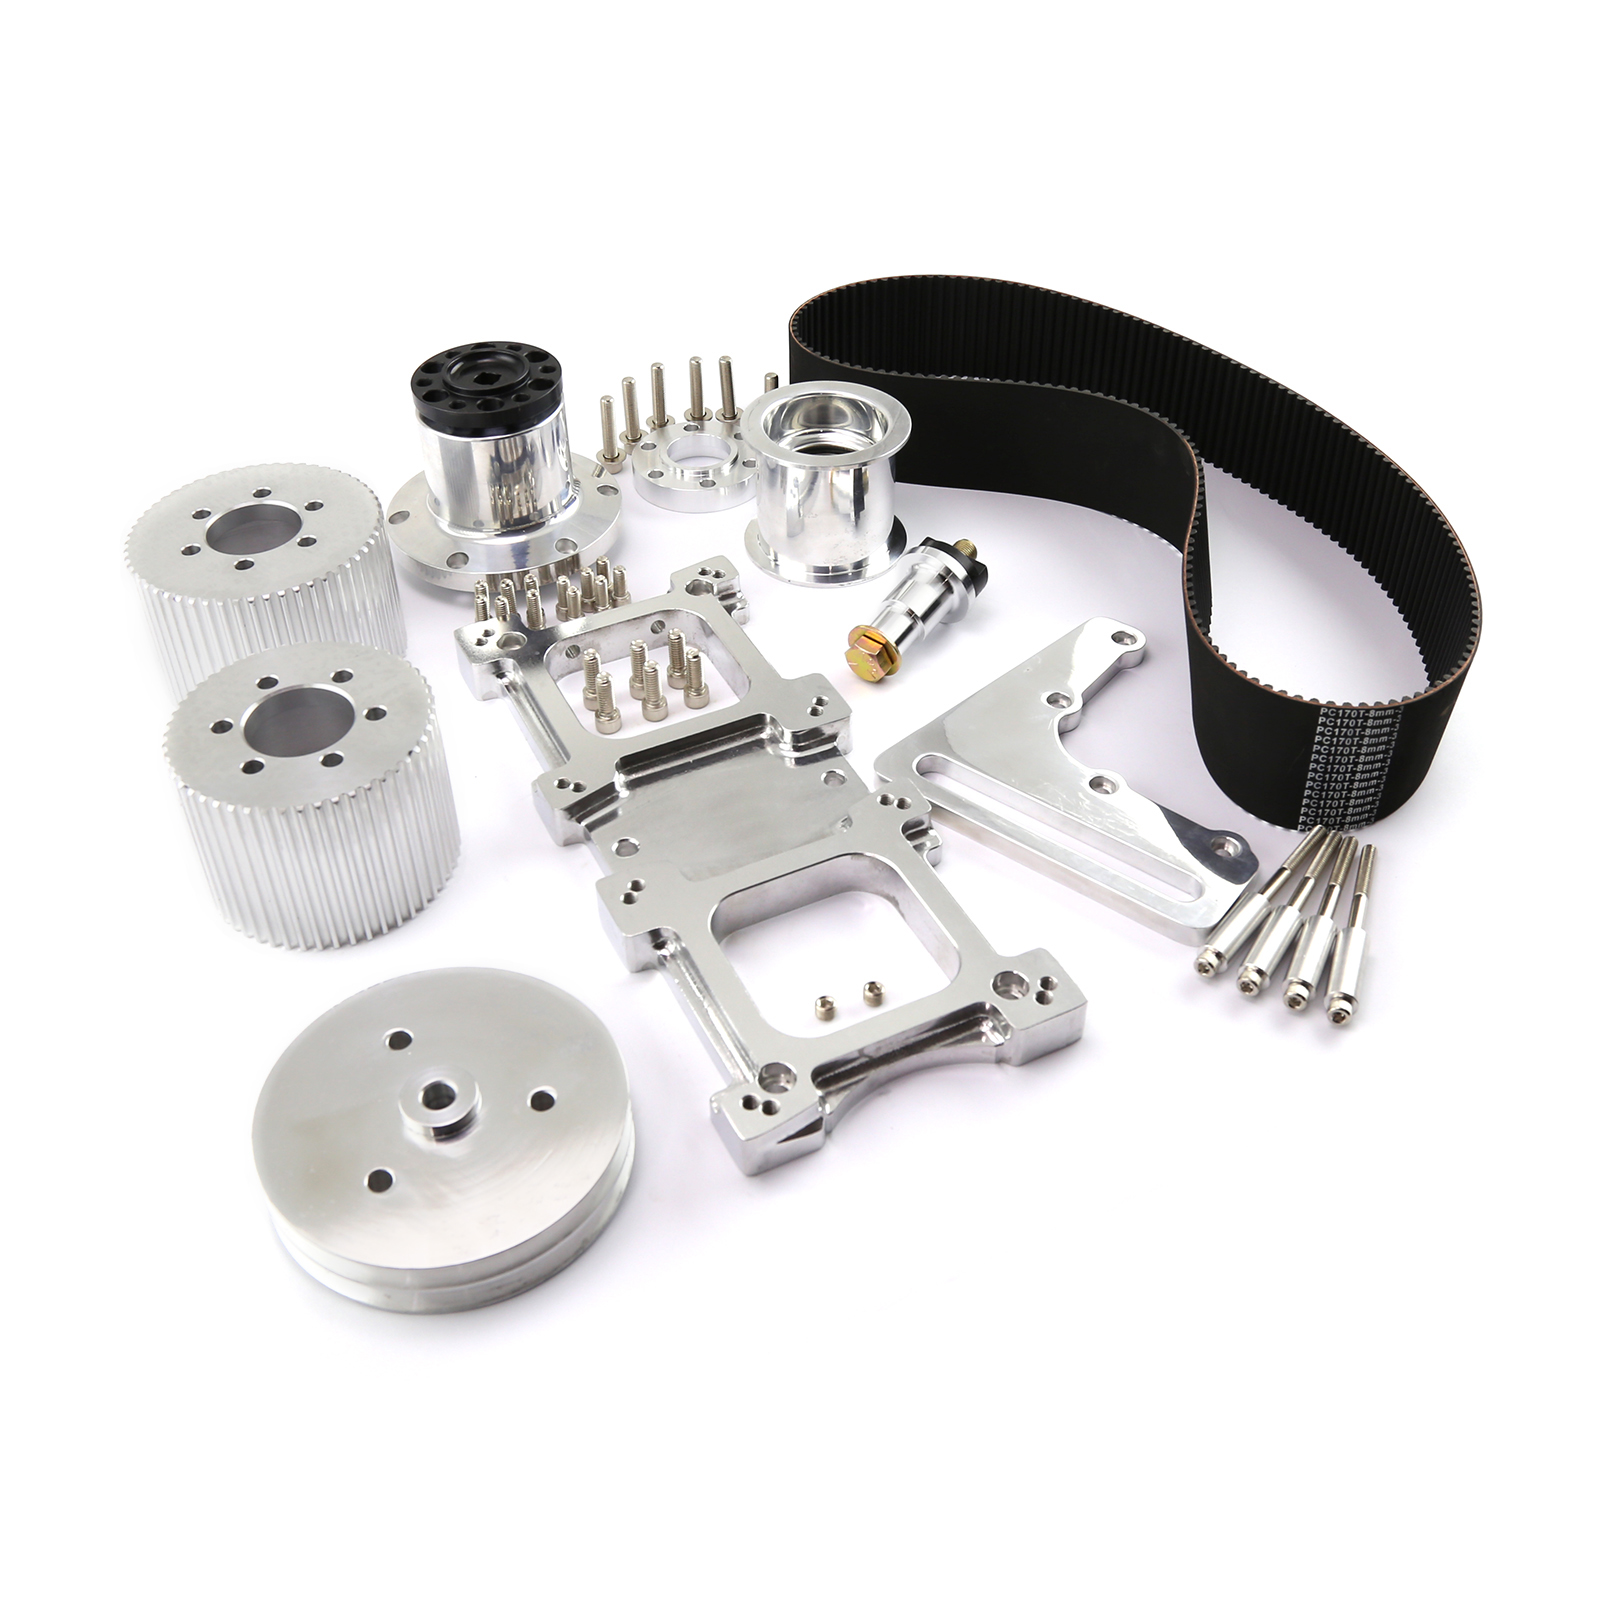 Roots Supercharger Kits: Chevy LS1 LS2 LS3 LS6 LS7 L76 Blower Drive Kit For 6-71 8